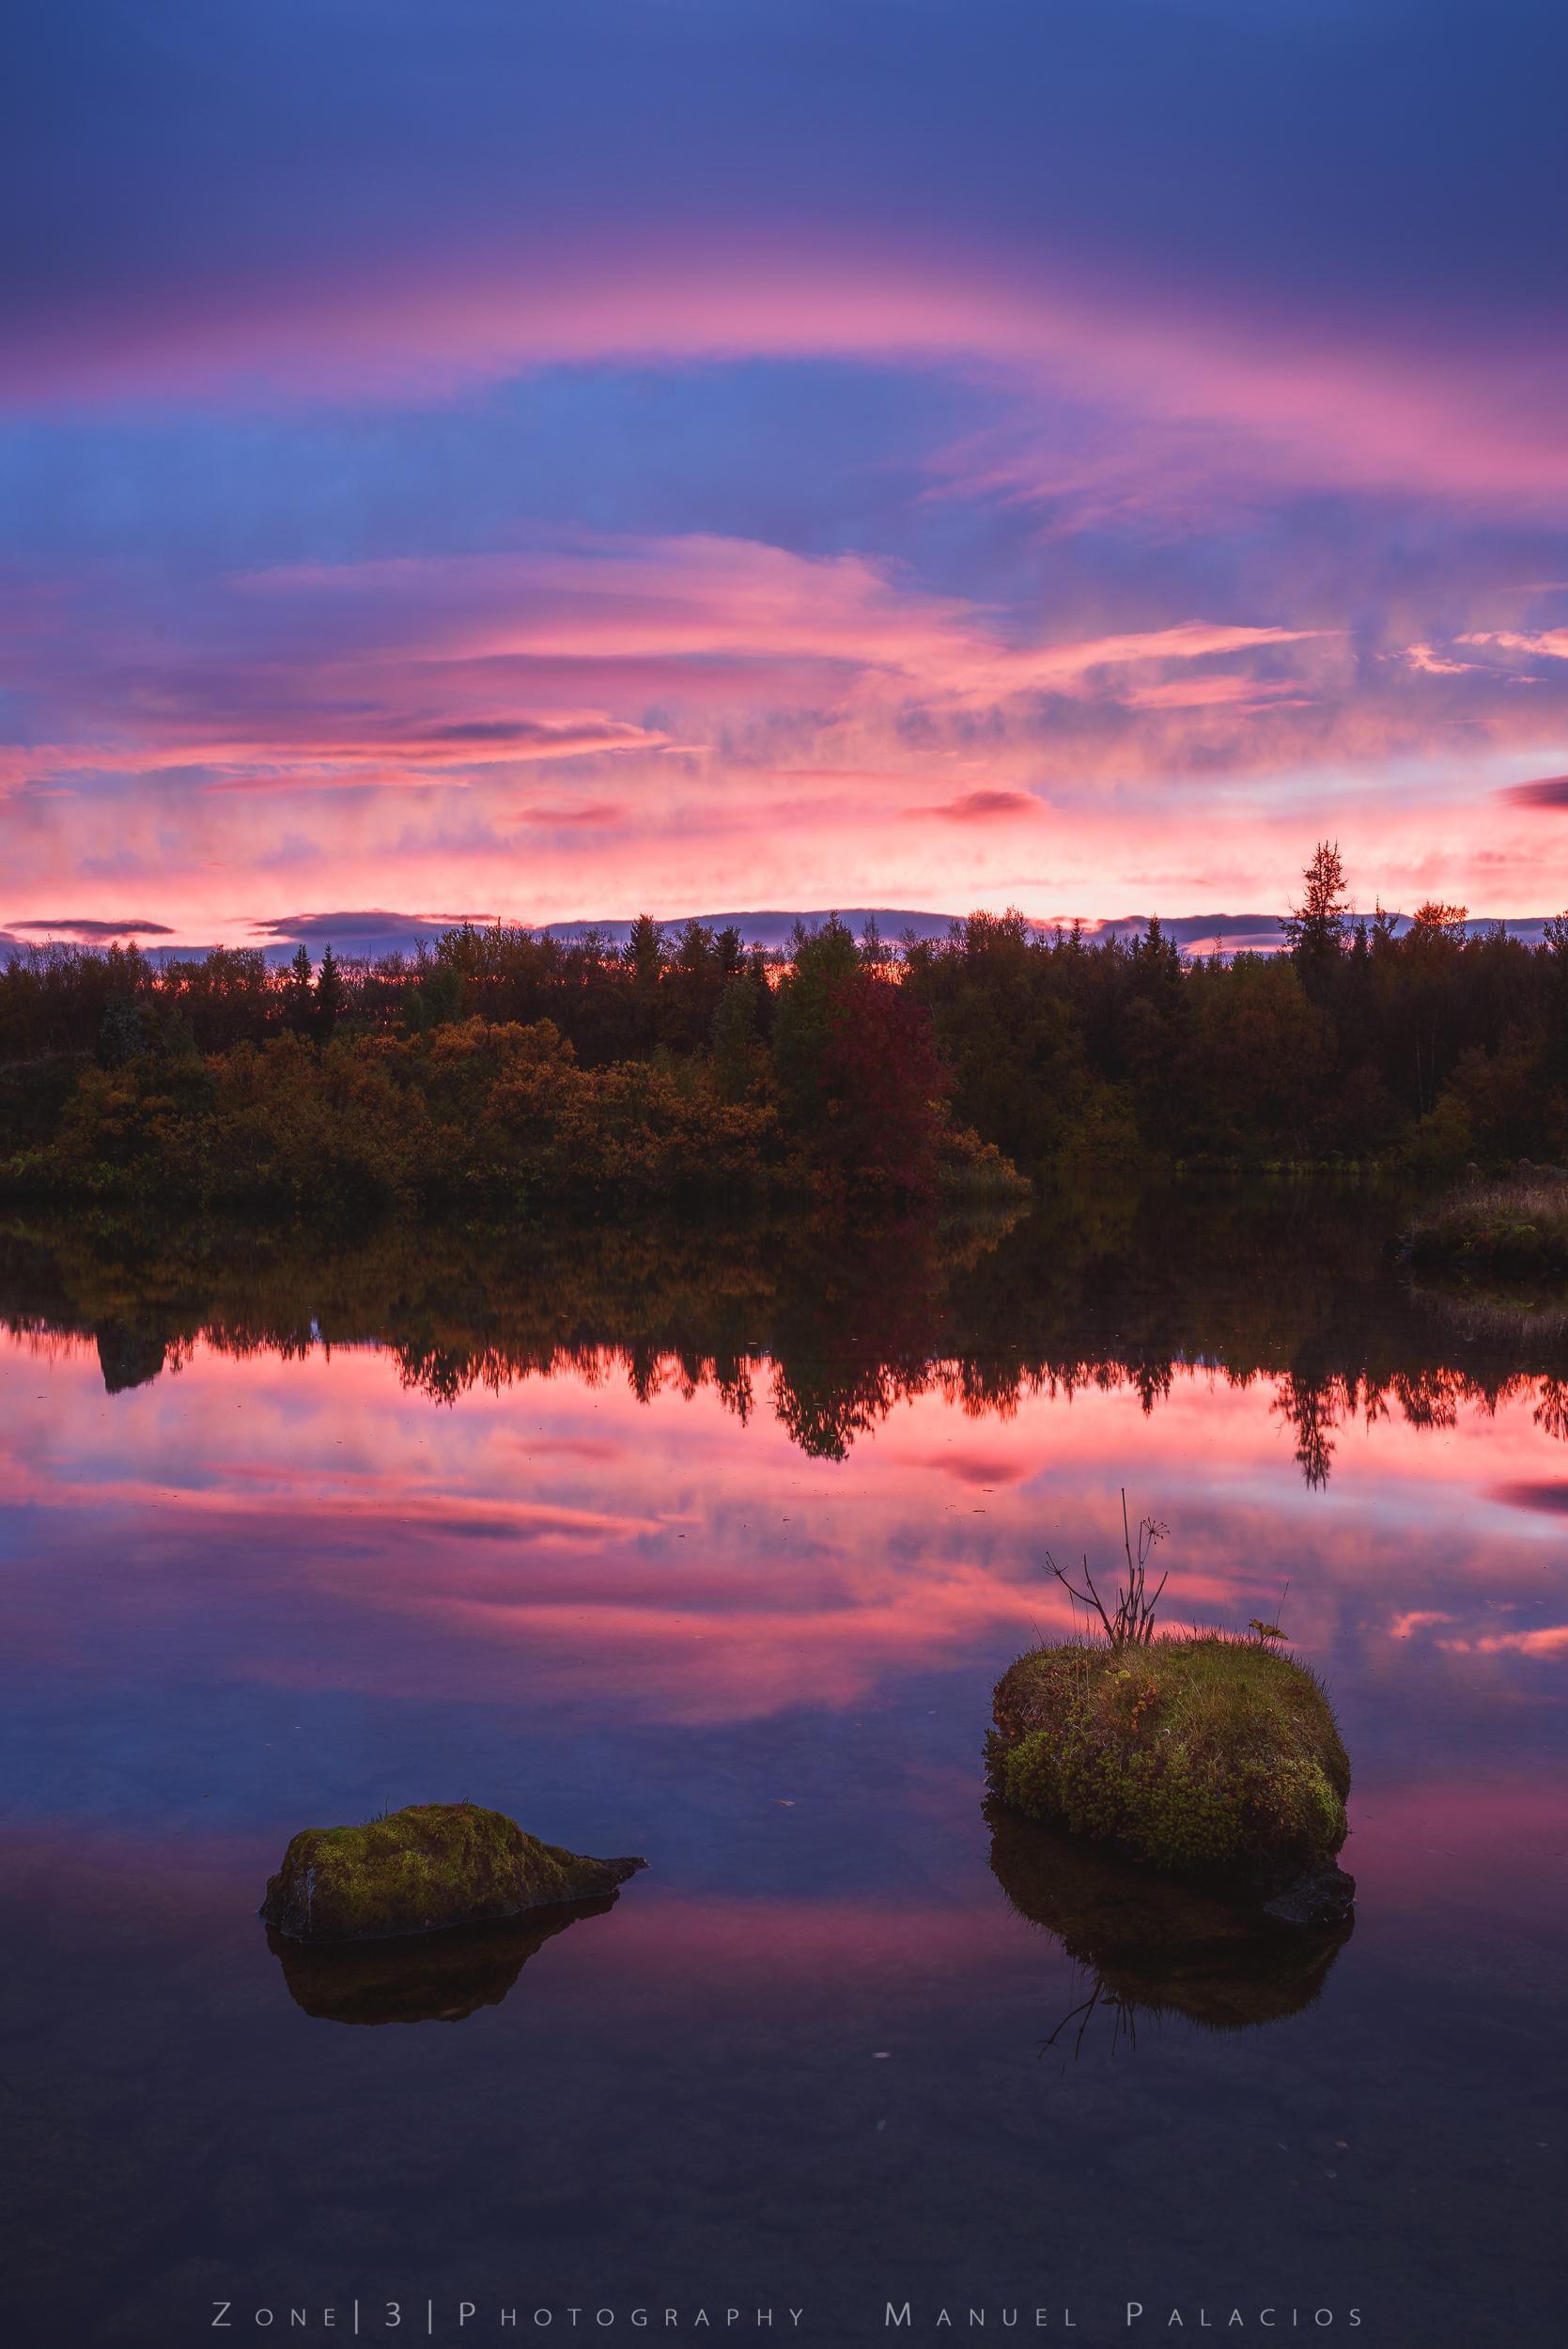 Thoughts of Mývatn